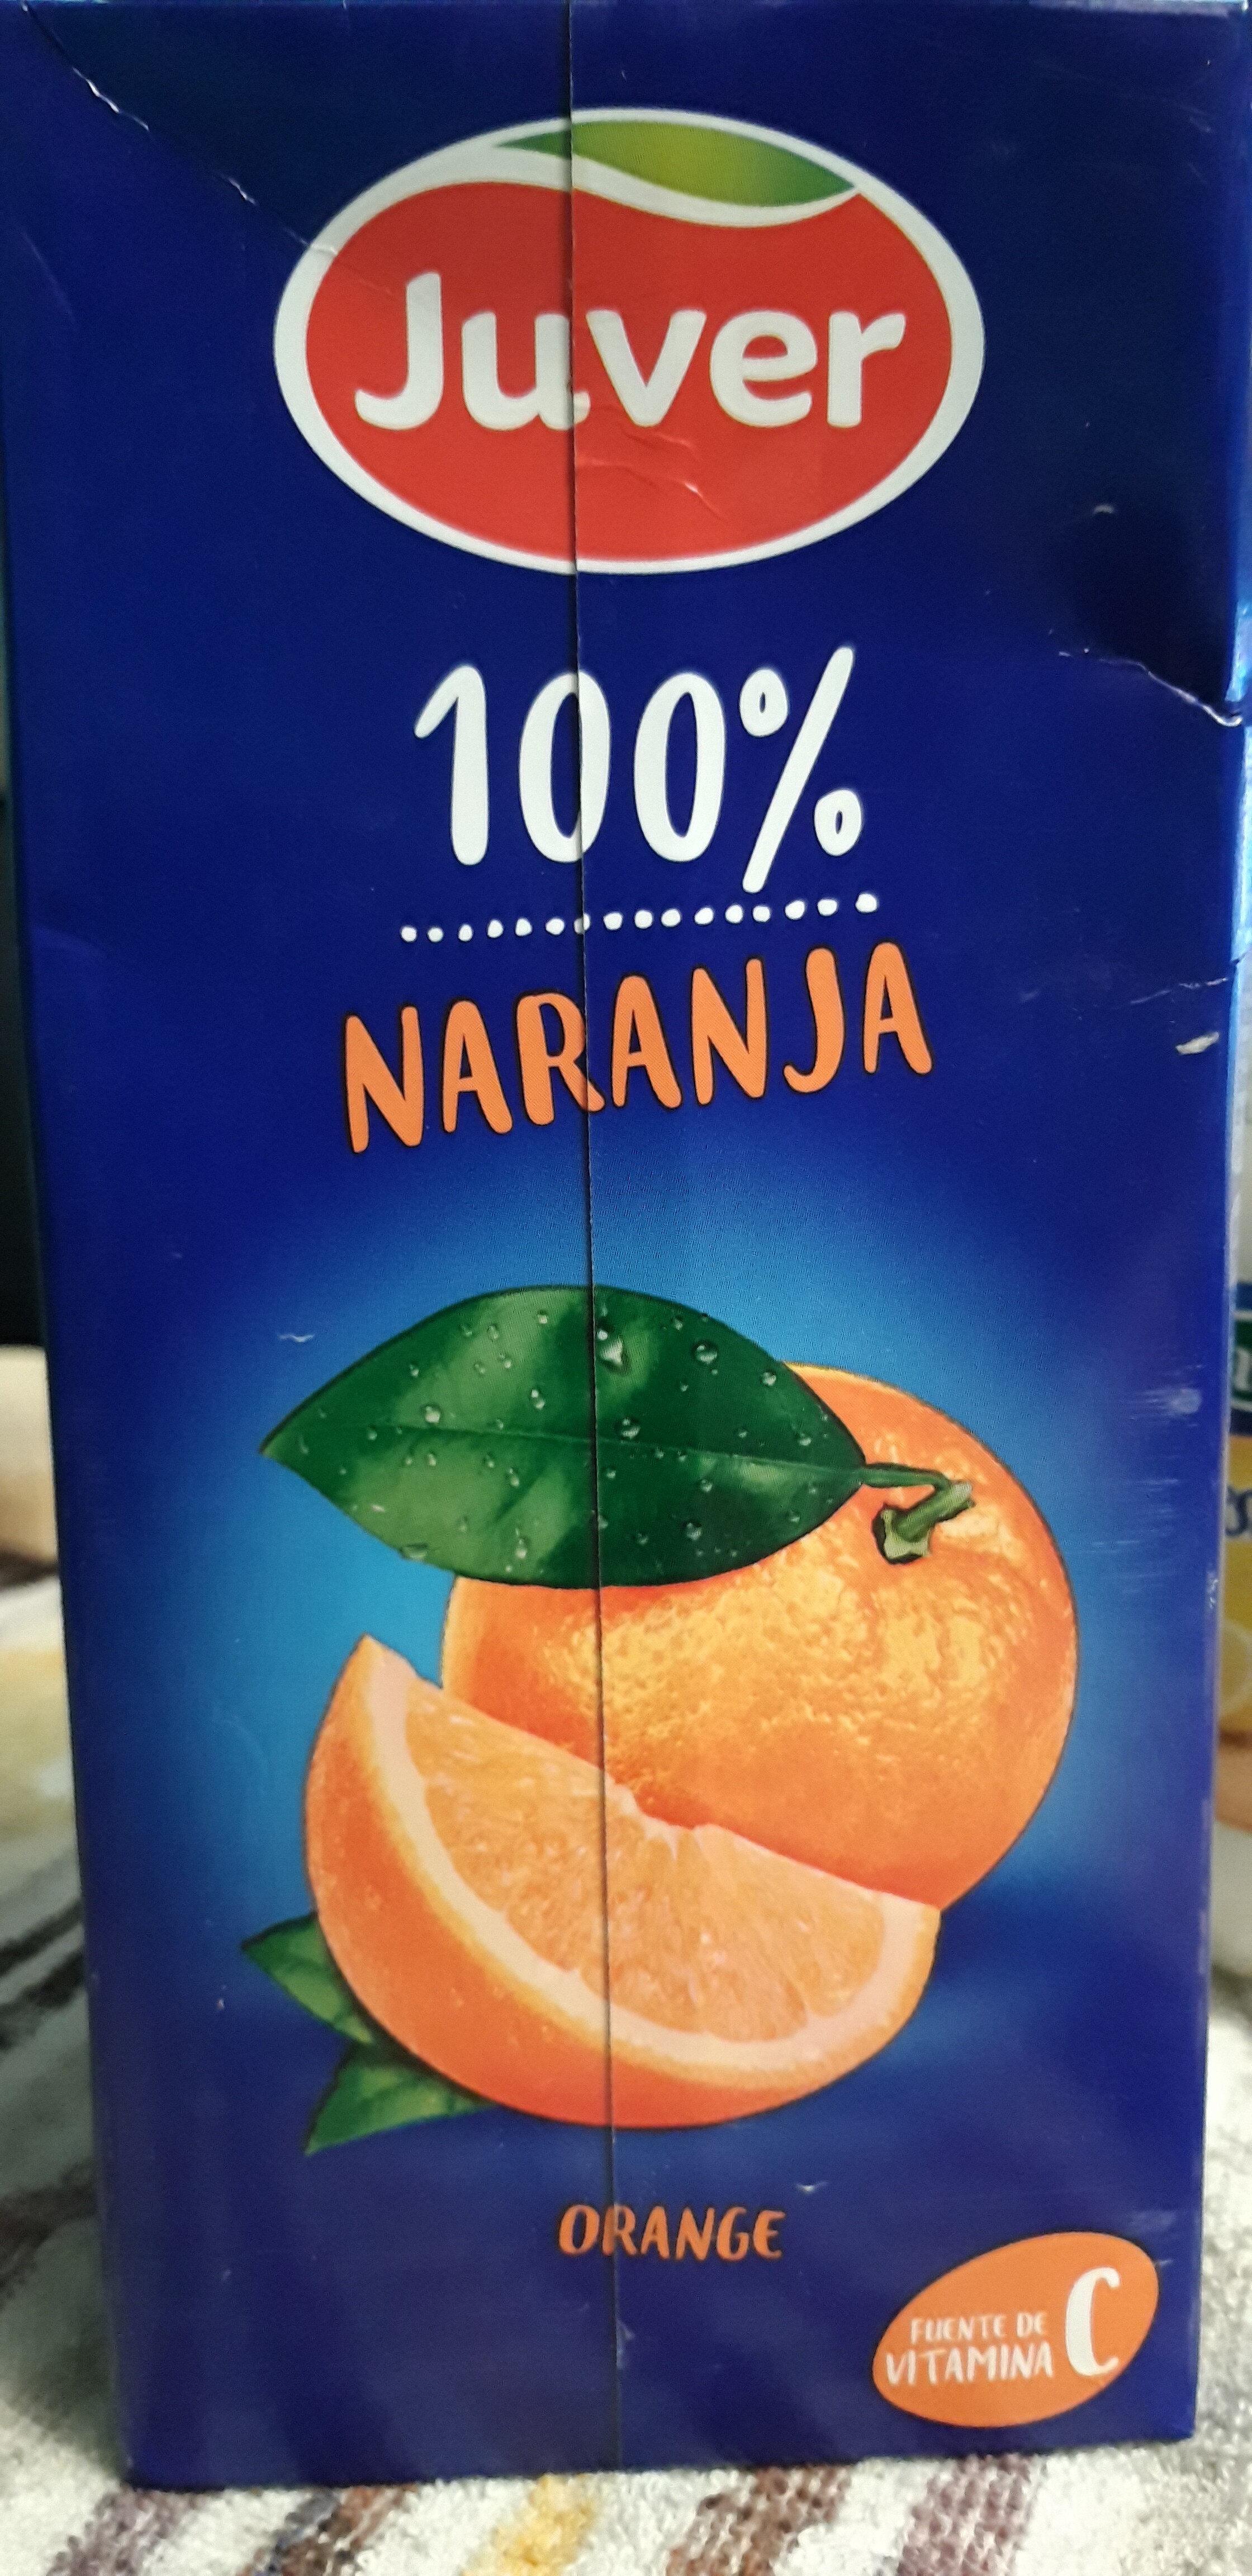 Juver 100% Orange - Producto